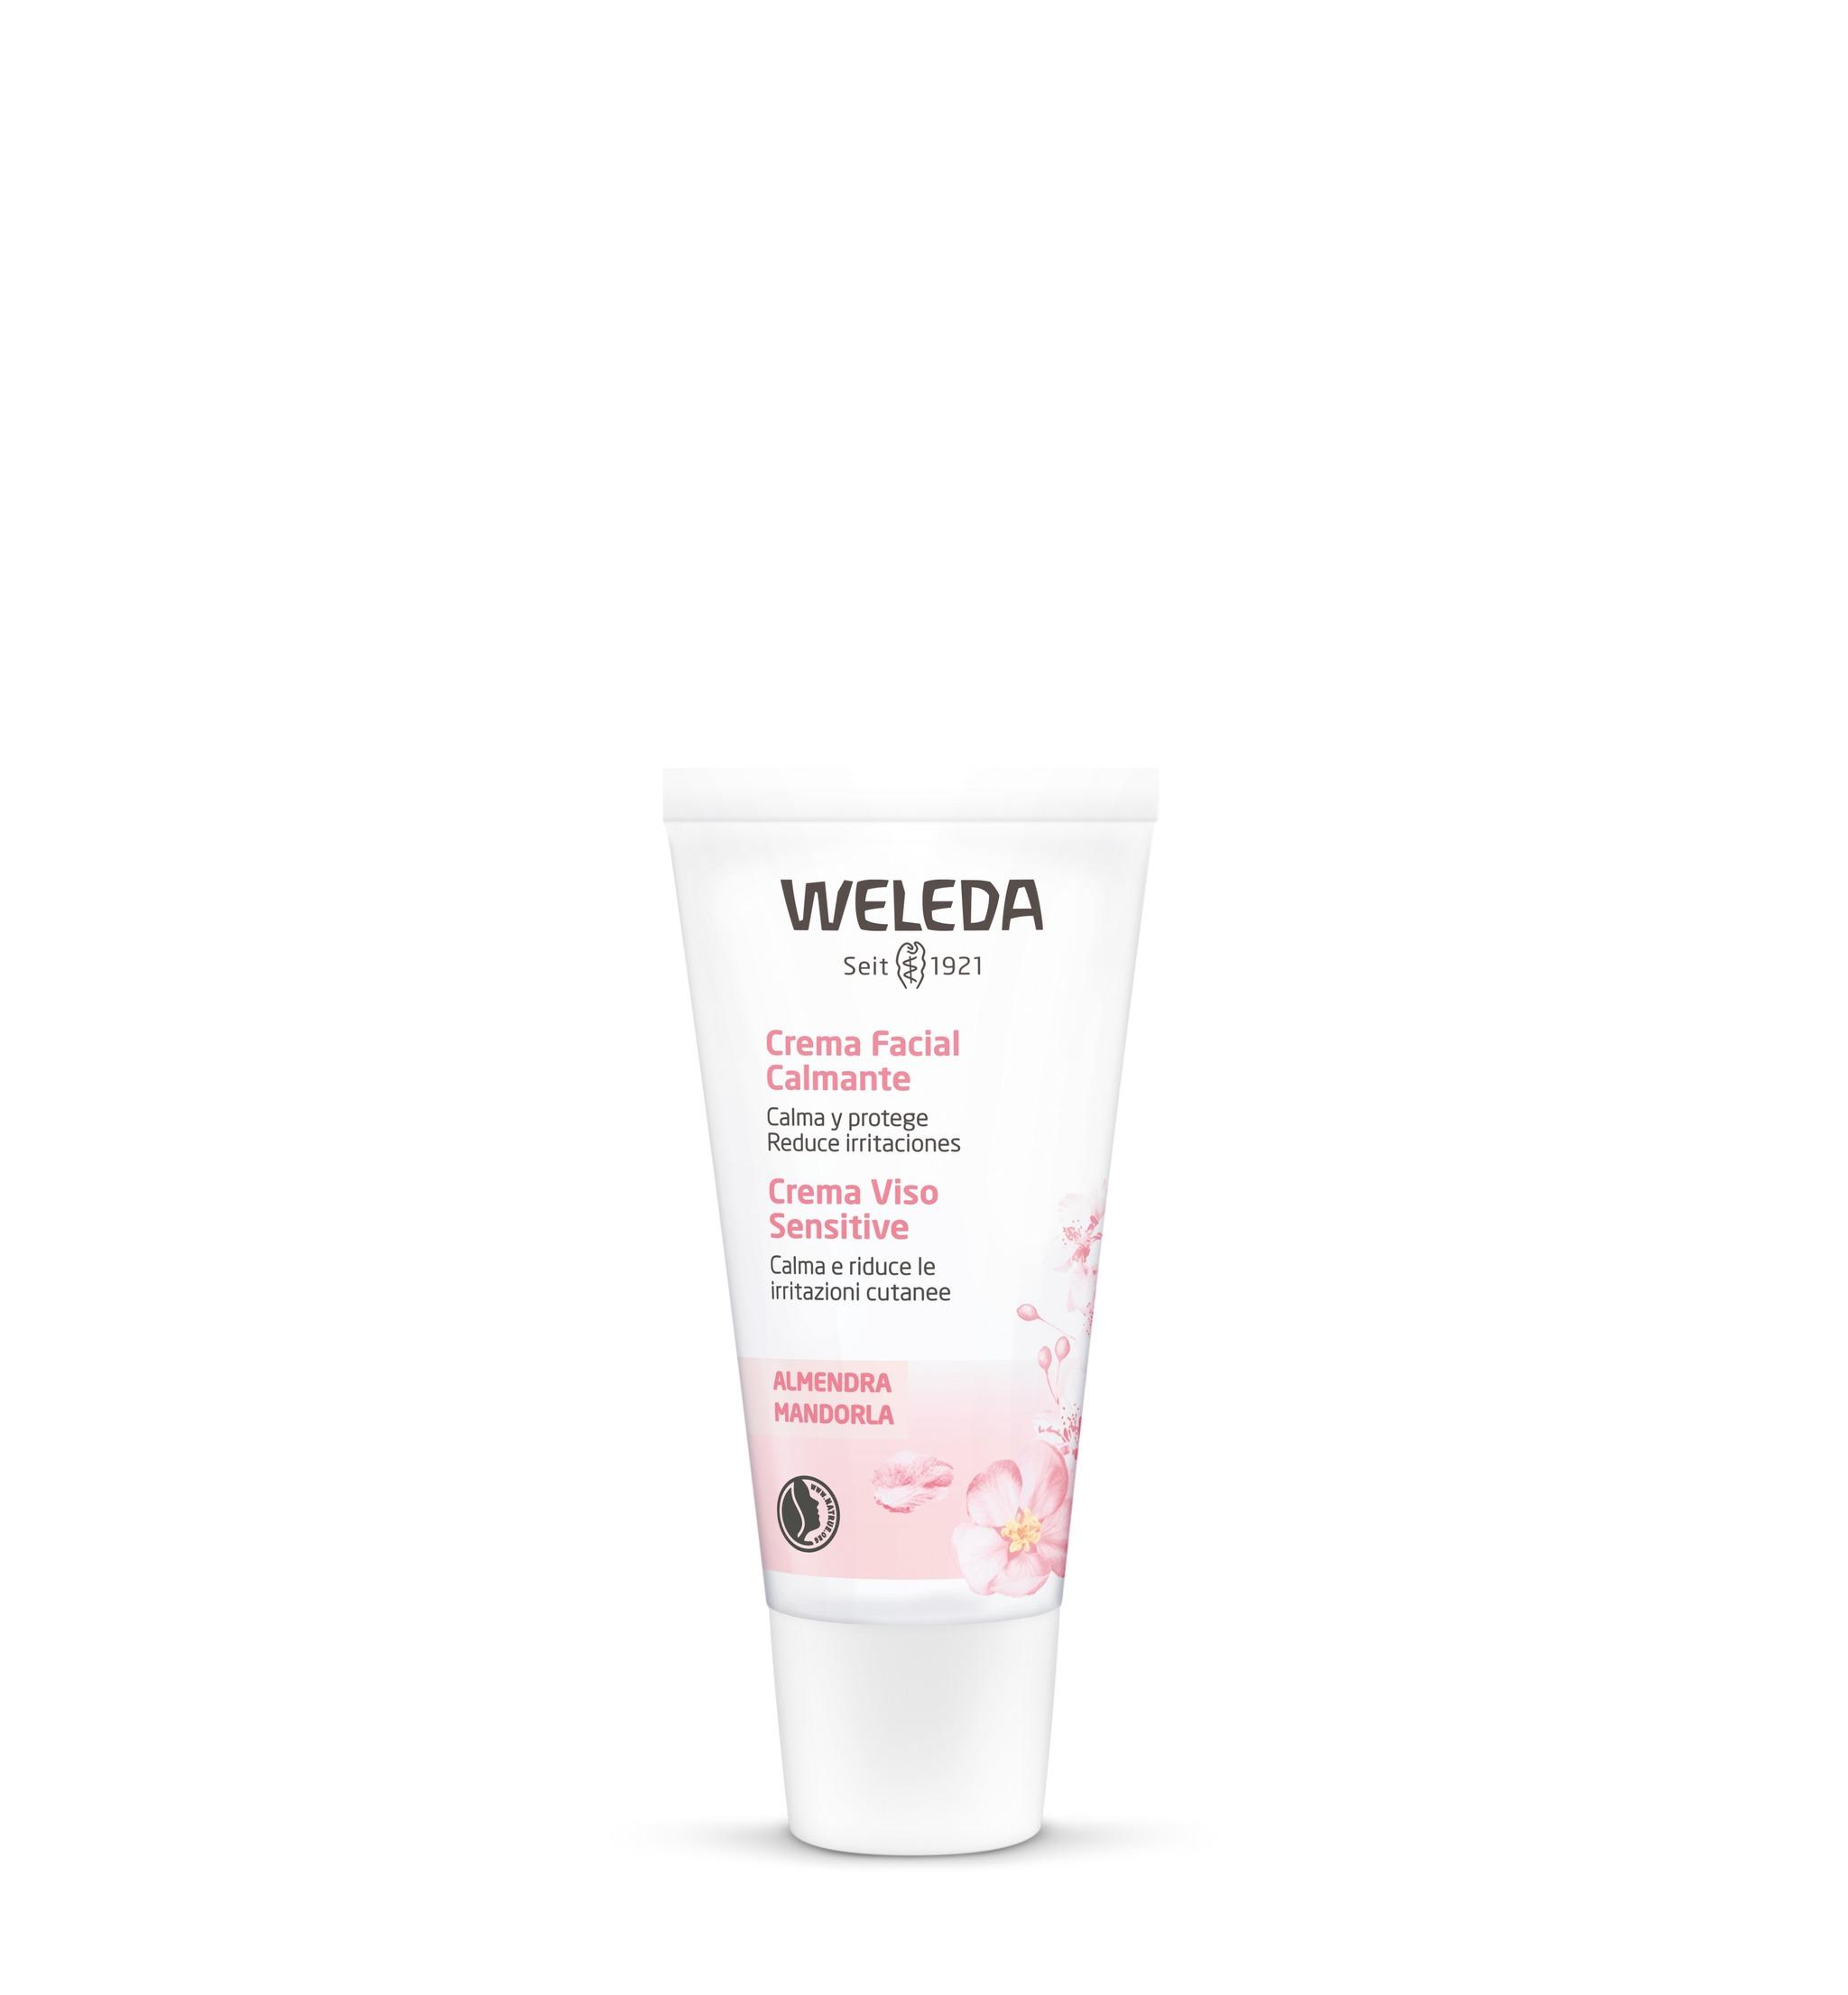 Crema Facial Calmante de Weleda, que fortalece, calma e hidrata la...